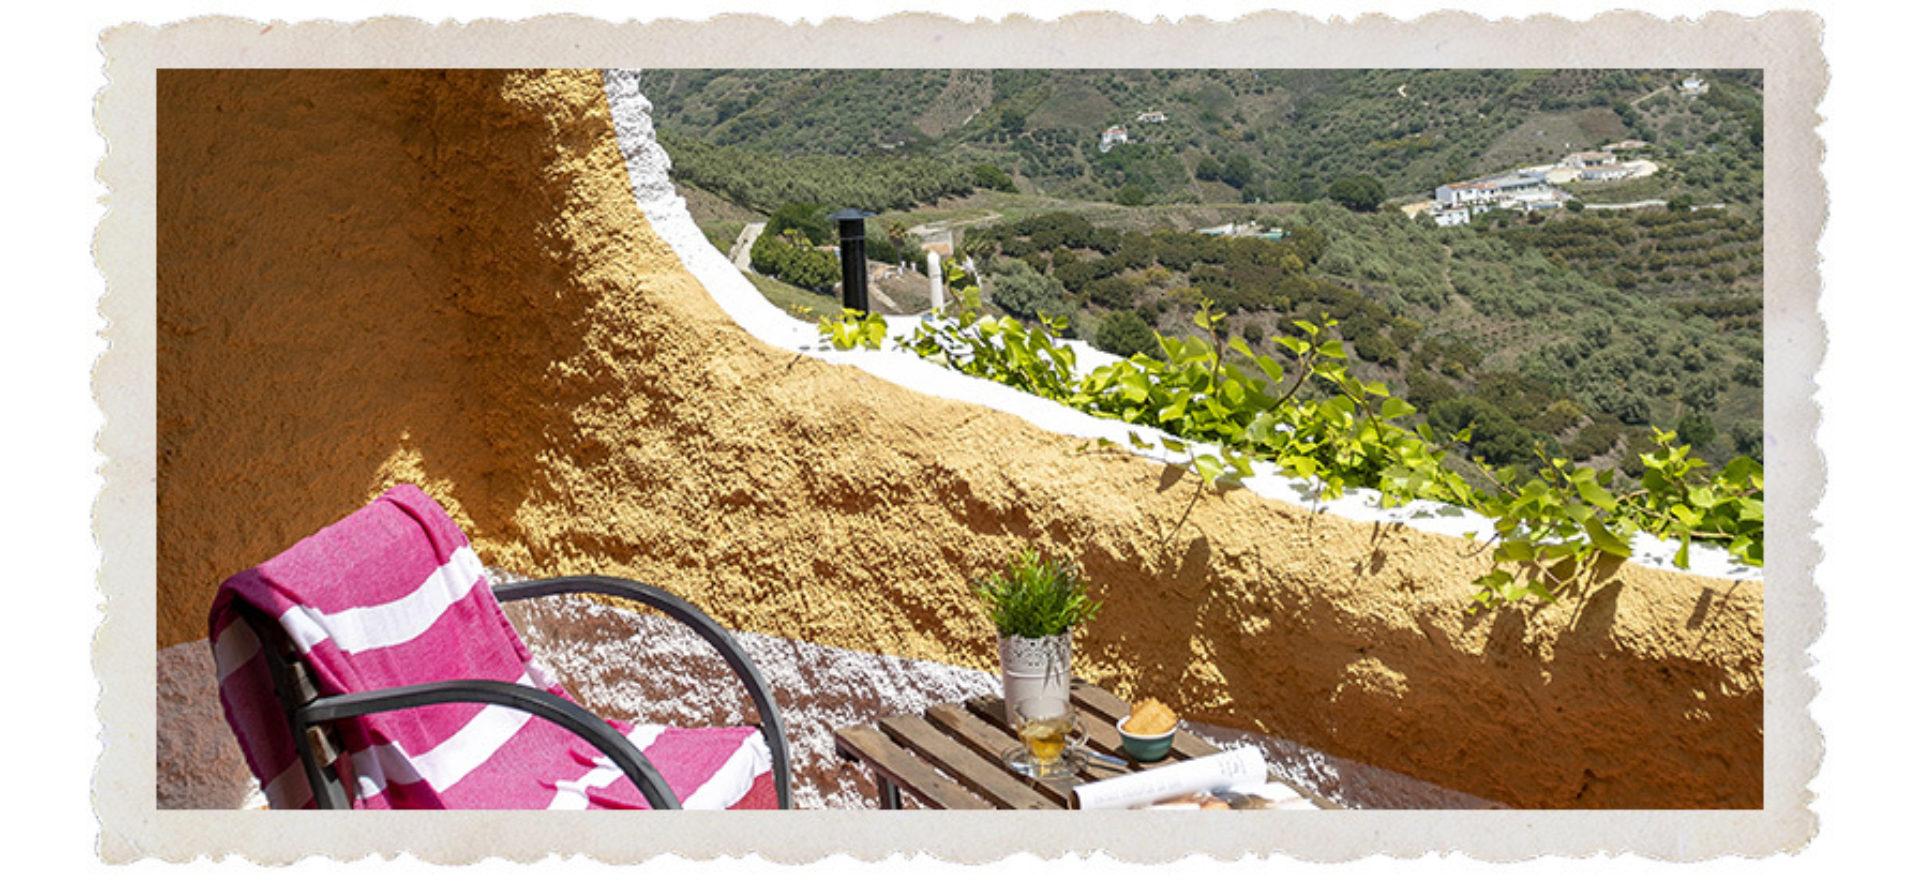 Reportage - Eliza toont je de andere kant van Ibiza